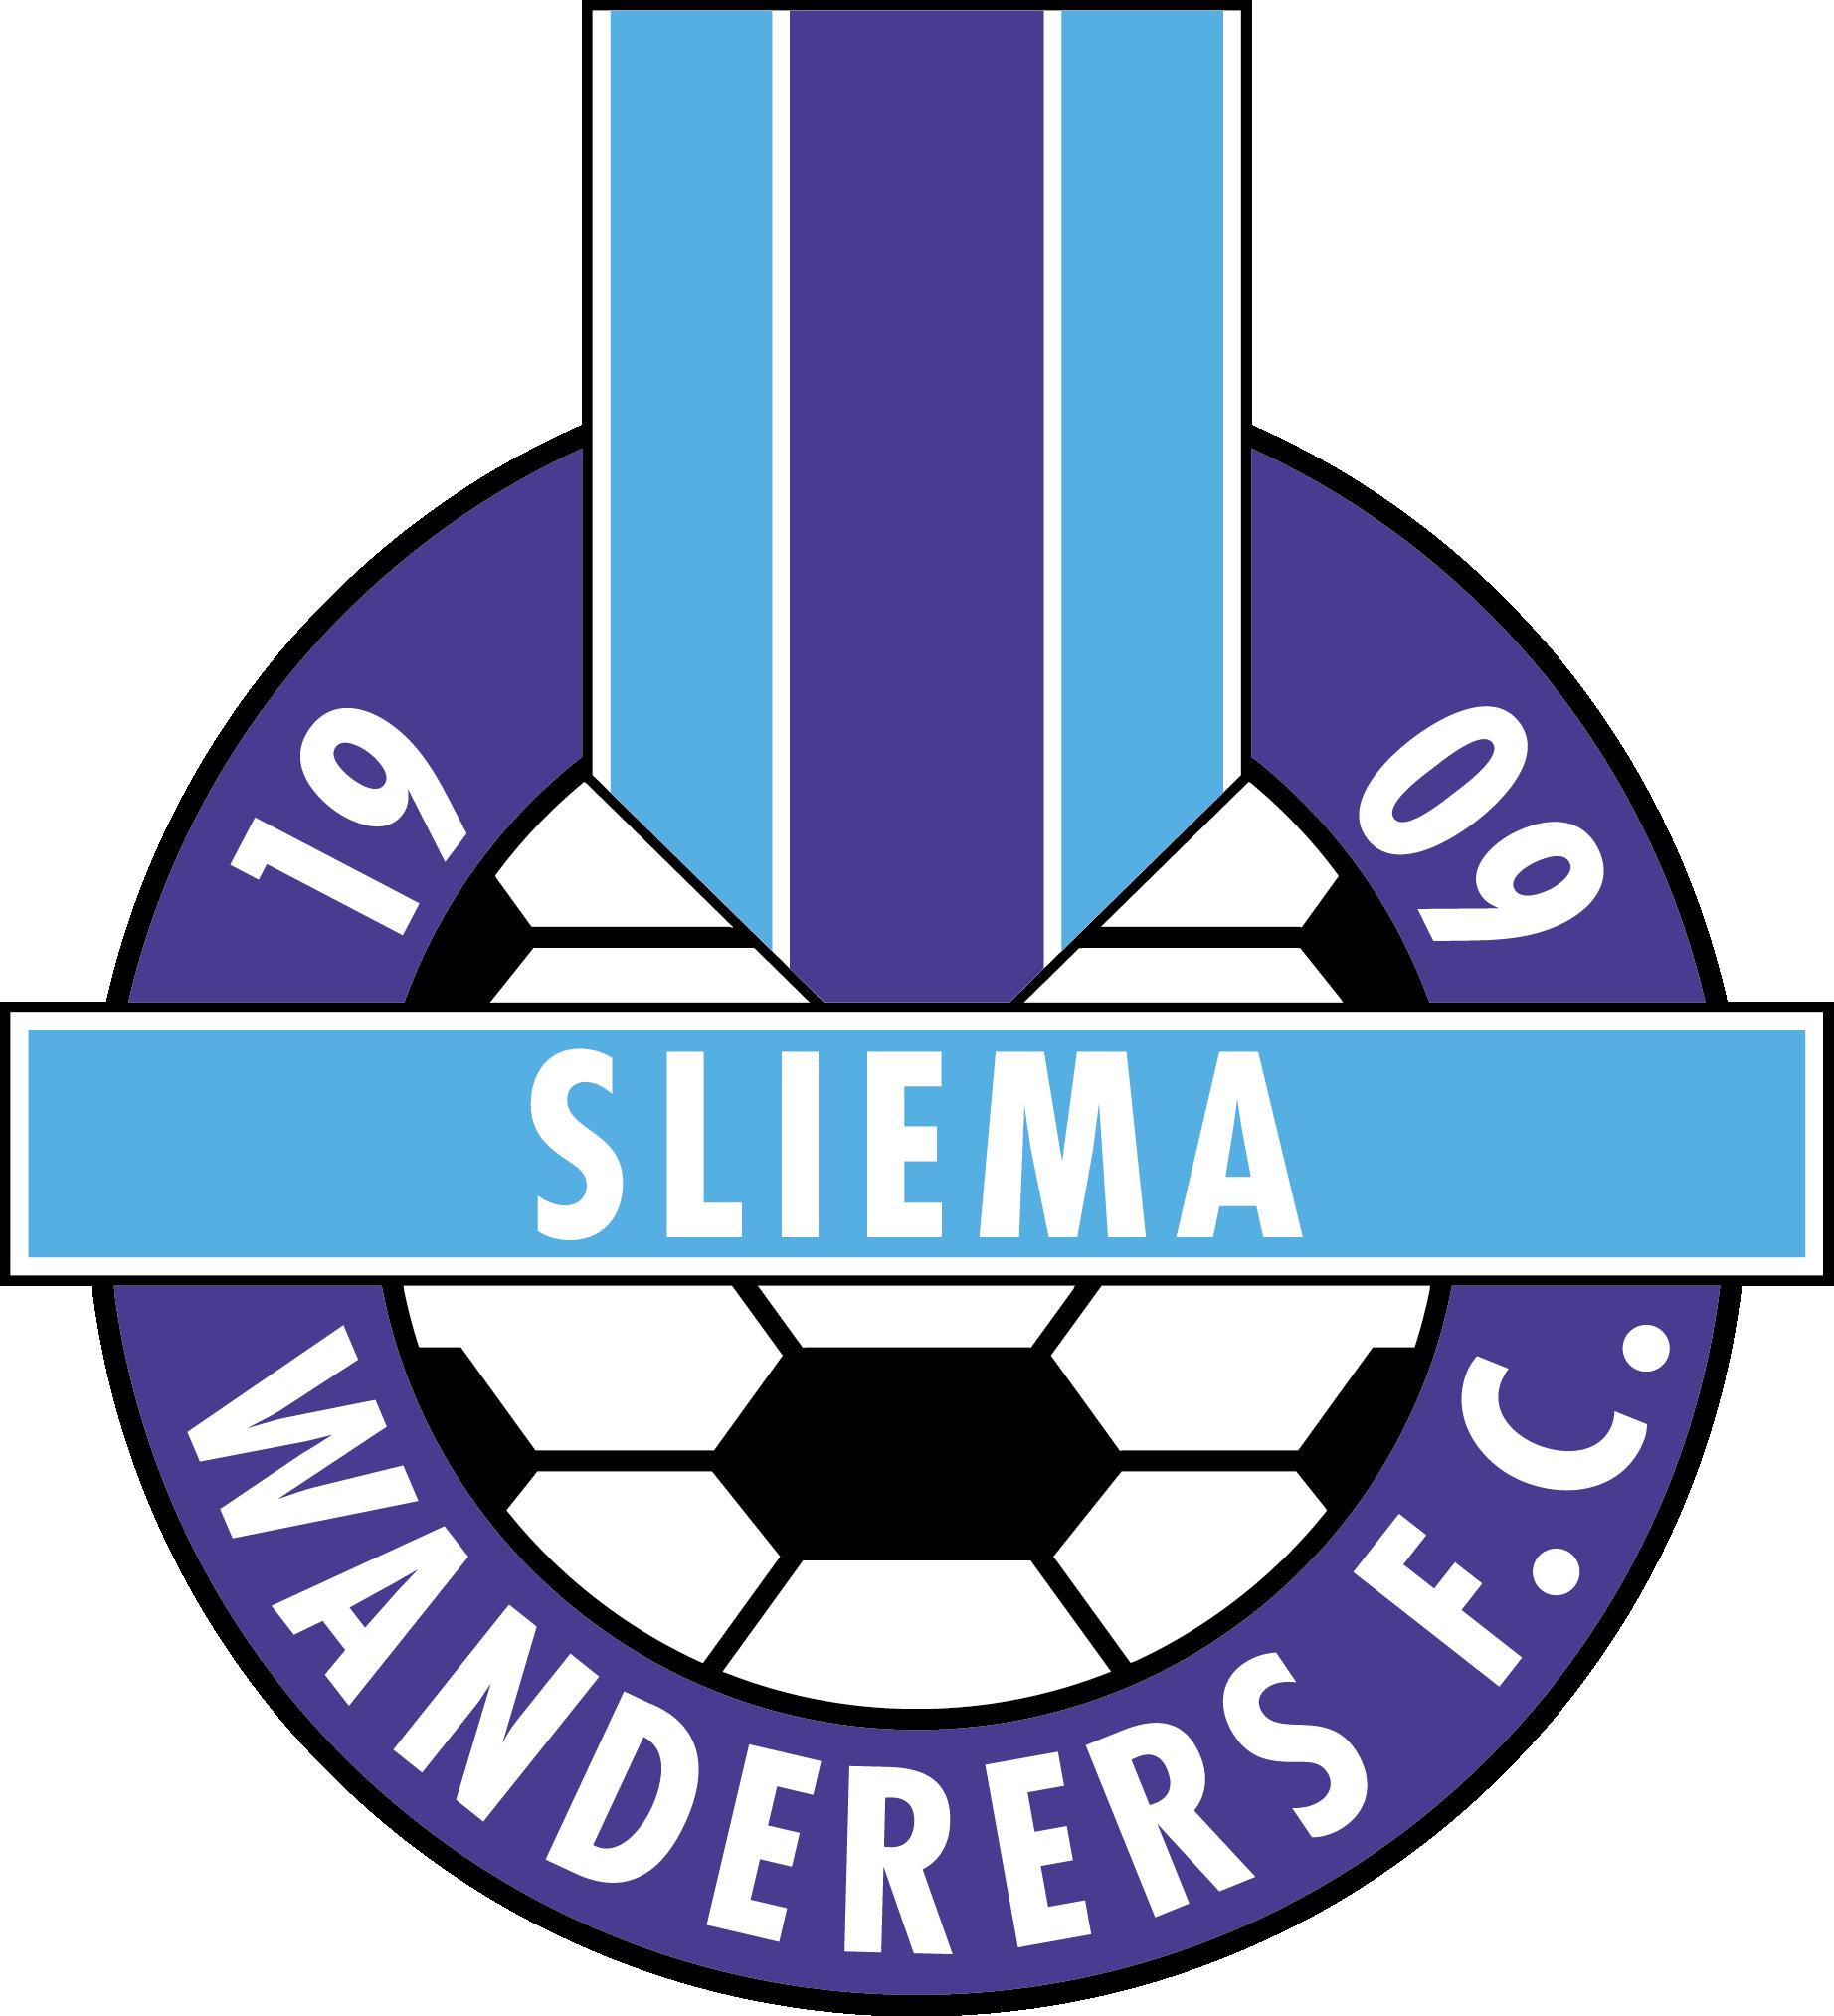 Auburn ncaa football white helmet logo clipart clip royalty free stock Sliema Wanderers FC | Football Logos | Pinterest clip royalty free stock